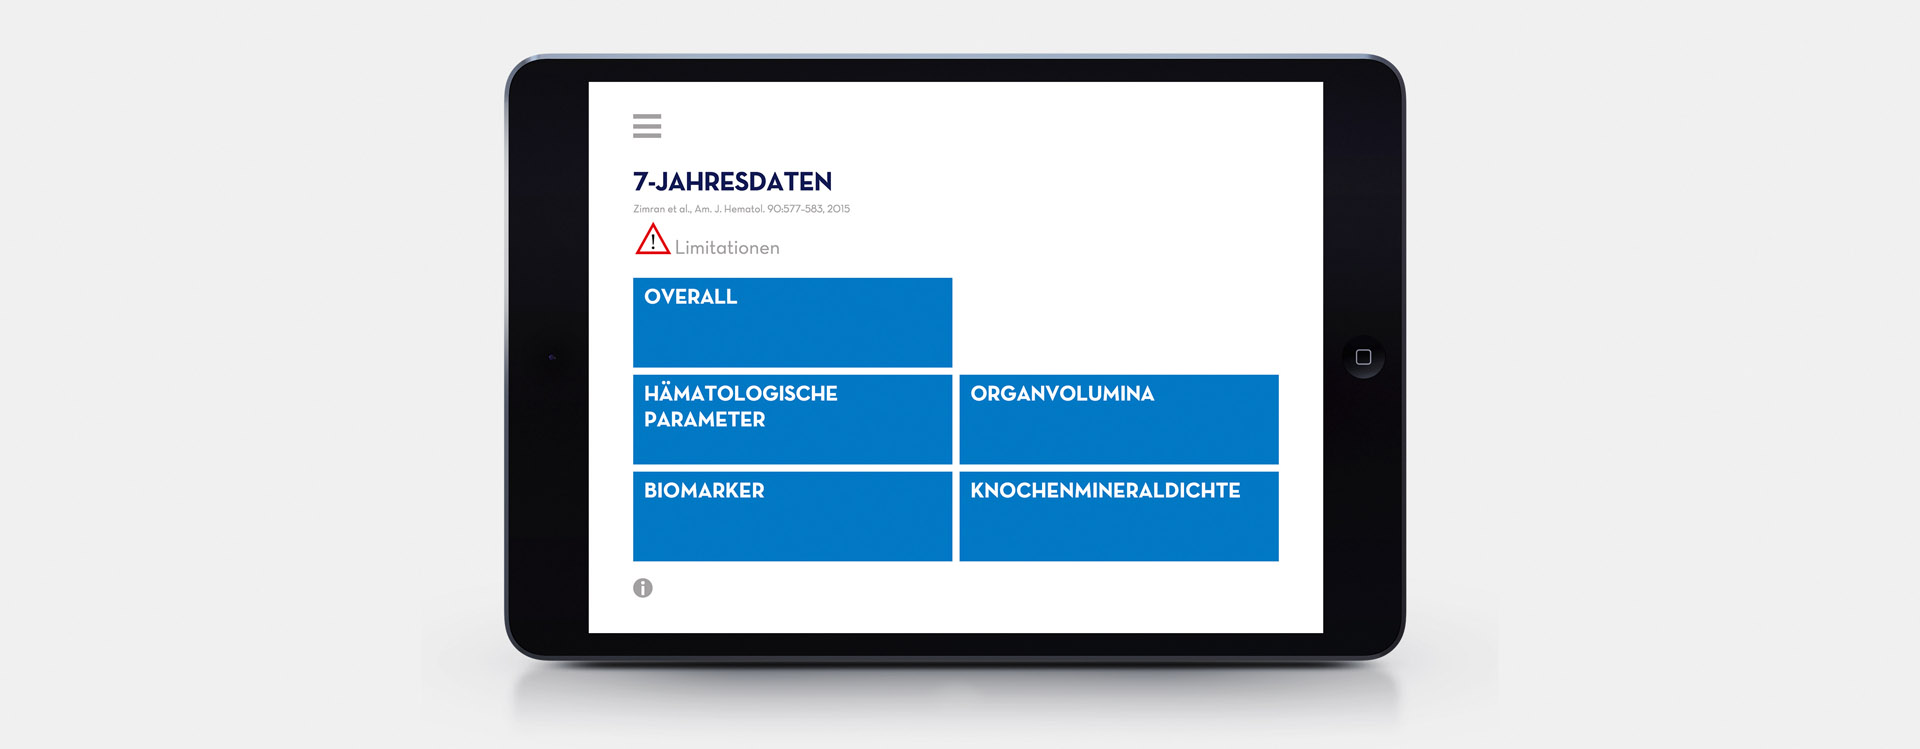 pharma werbung wegener shire vpriv besprechungsfolder ipad app